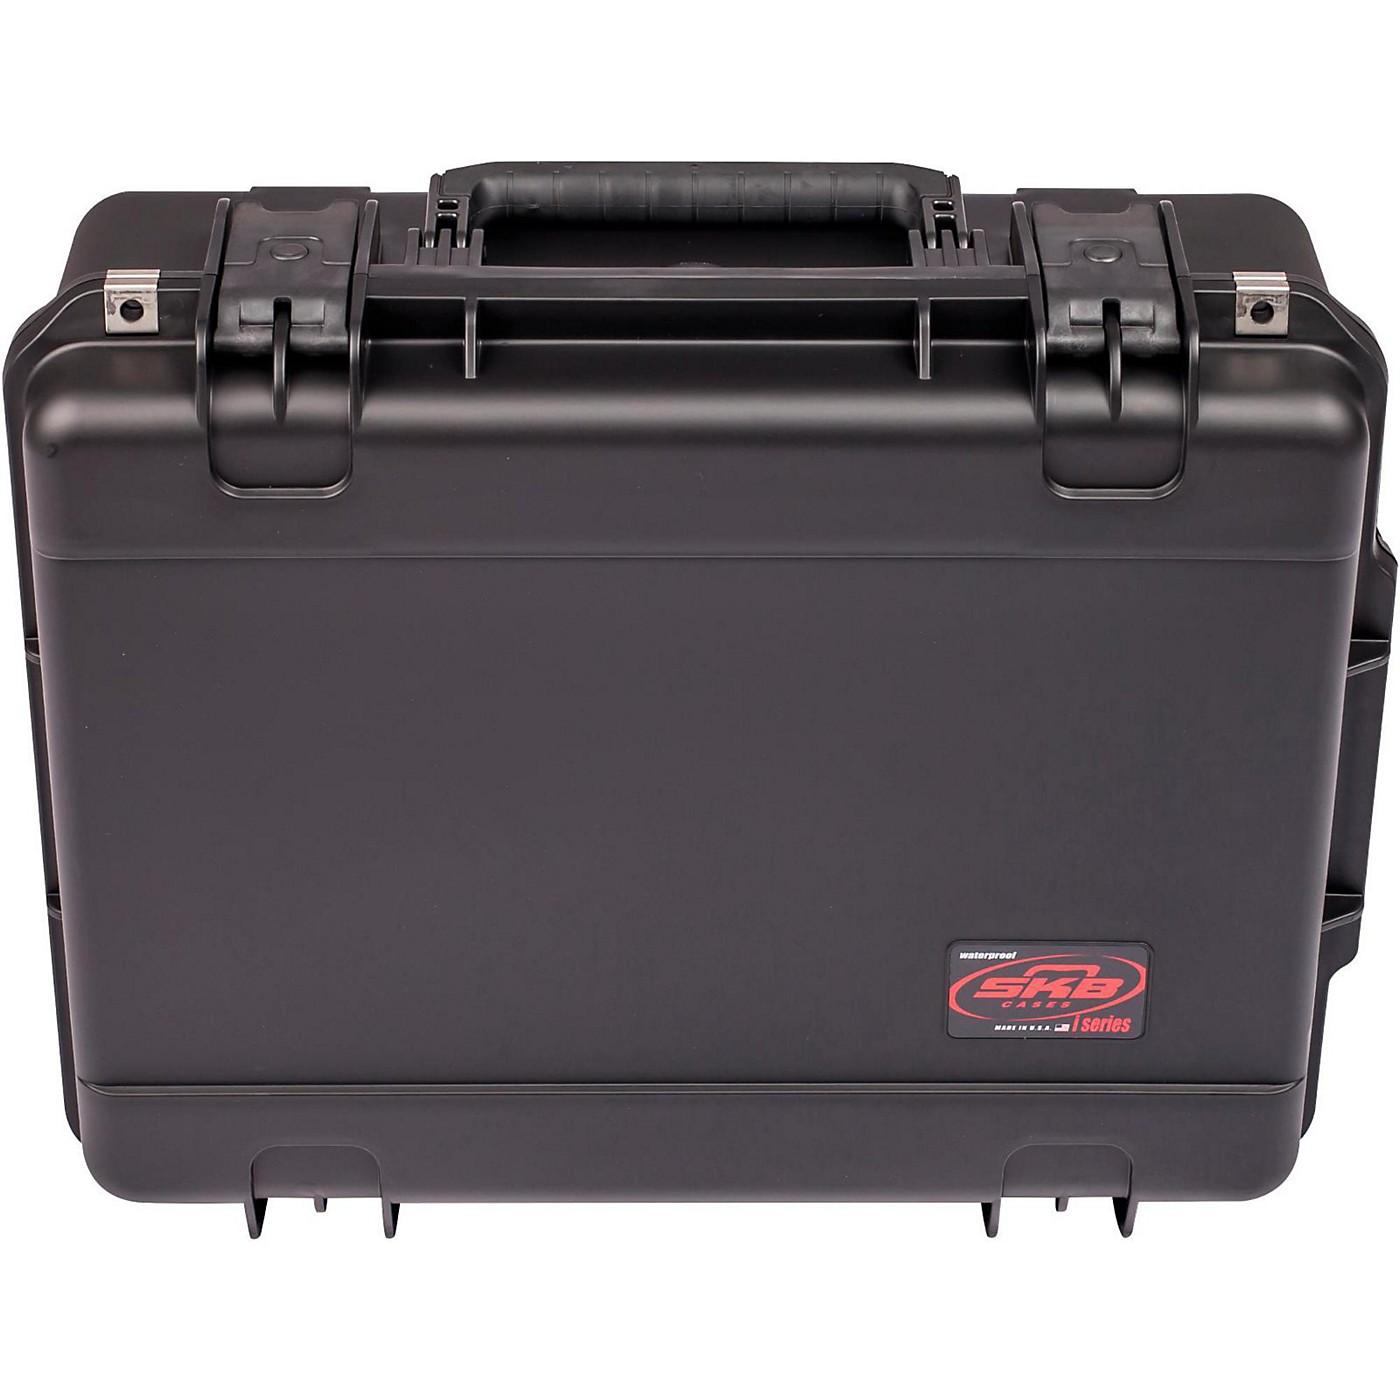 SKB 3i-2015-7B Military Standard Waterproof Case thumbnail